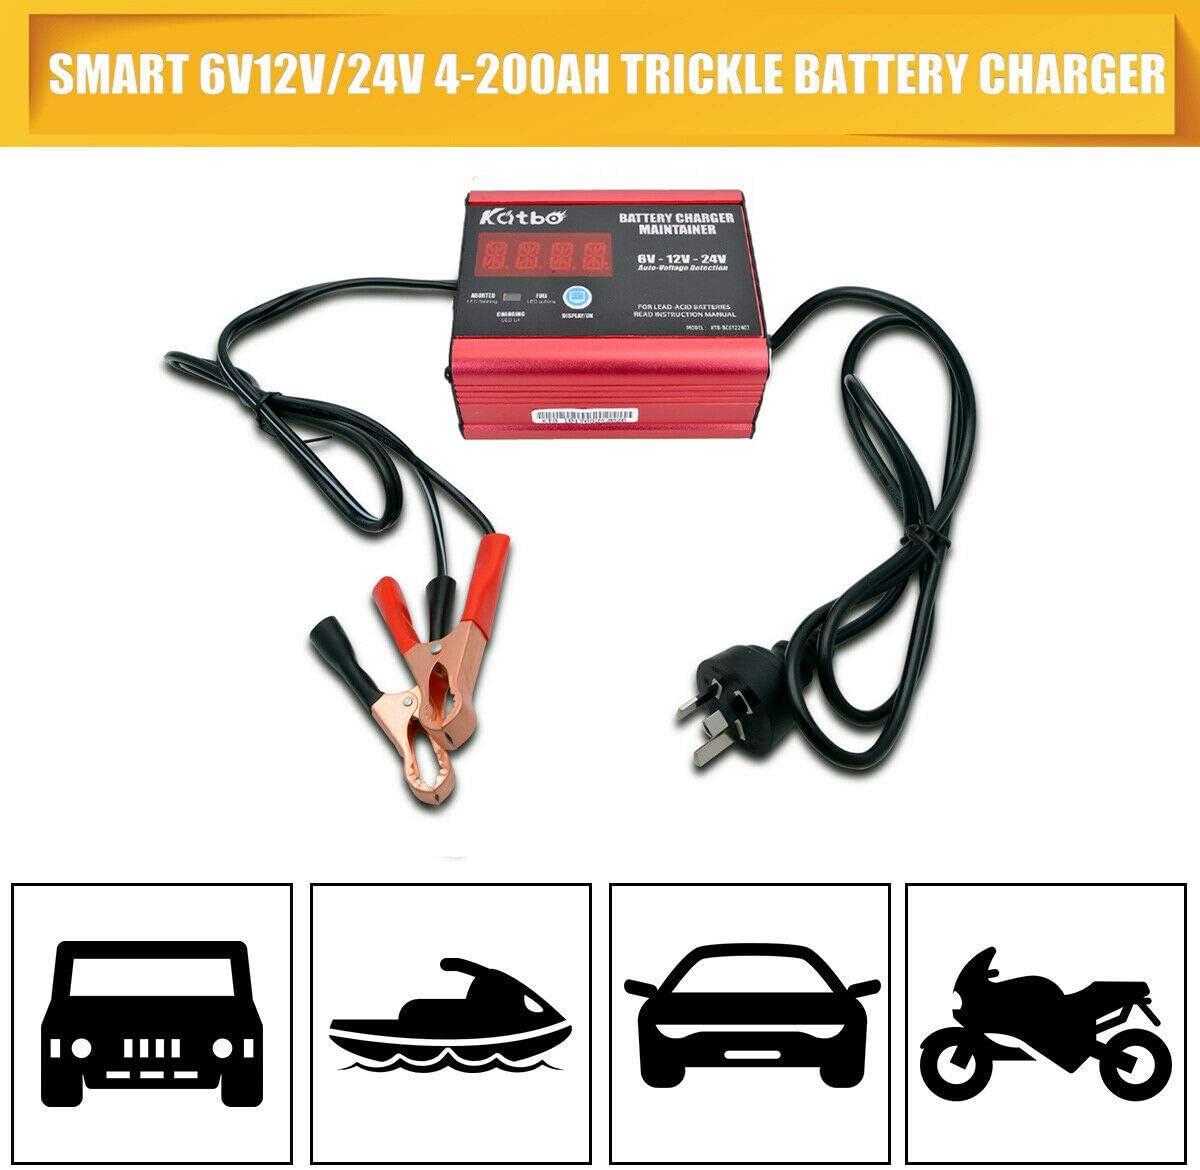 : Sunwan Chargeur de batterie 12 V24 V pour